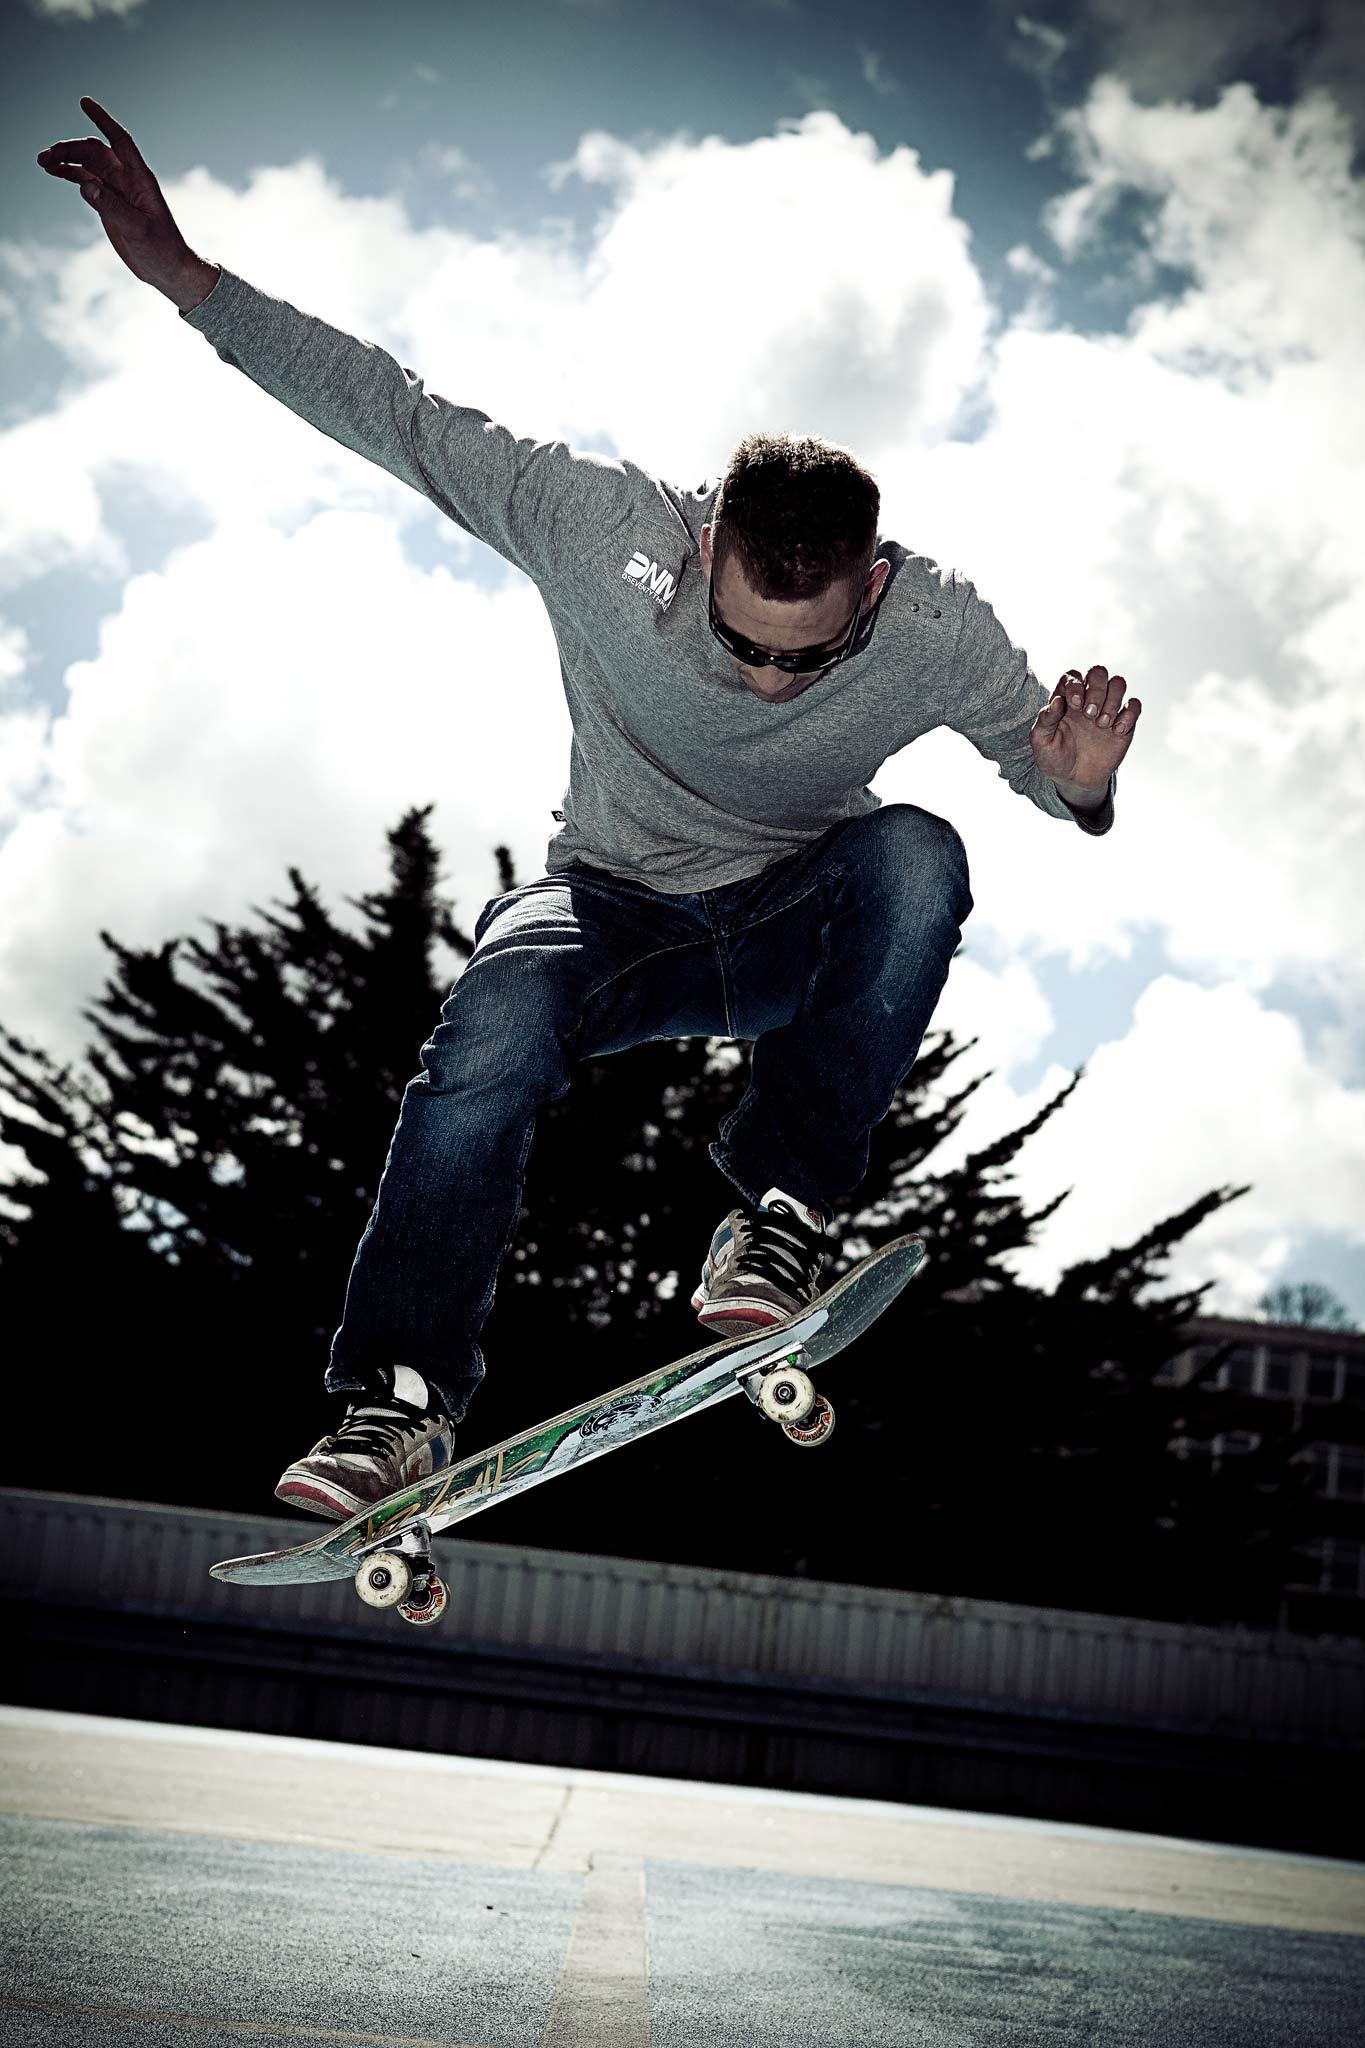 Skater Cornwall Truro